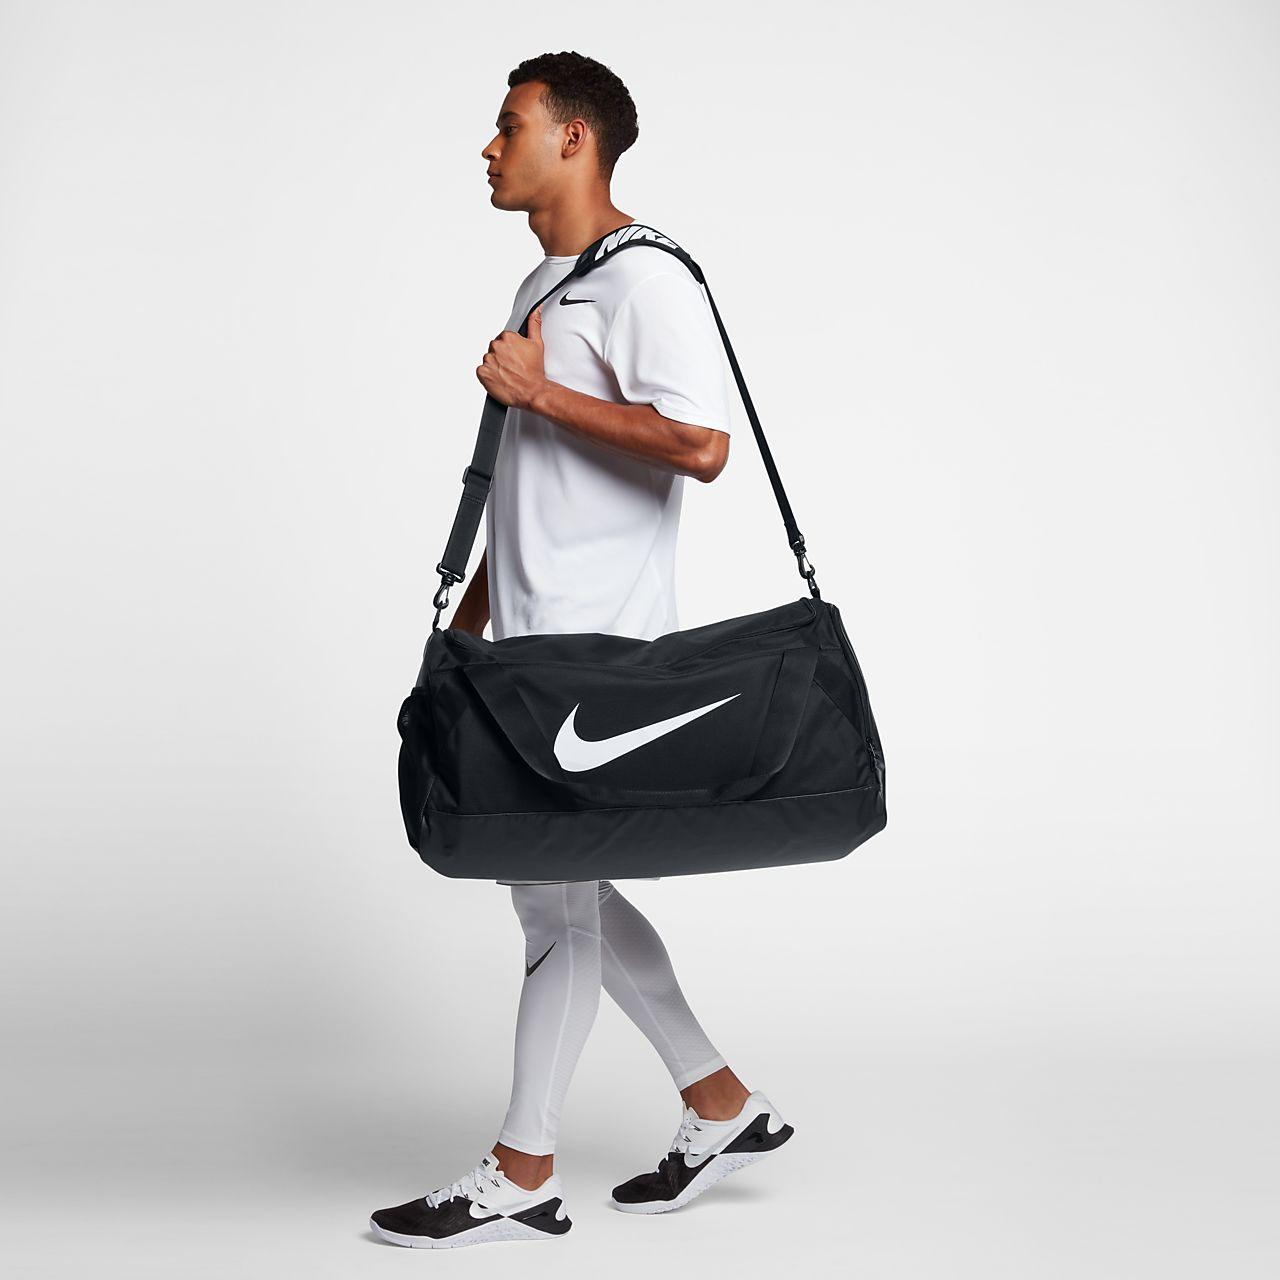 b52509c53f Borsone da training Nike Brasilia (grande). Nike.com IT